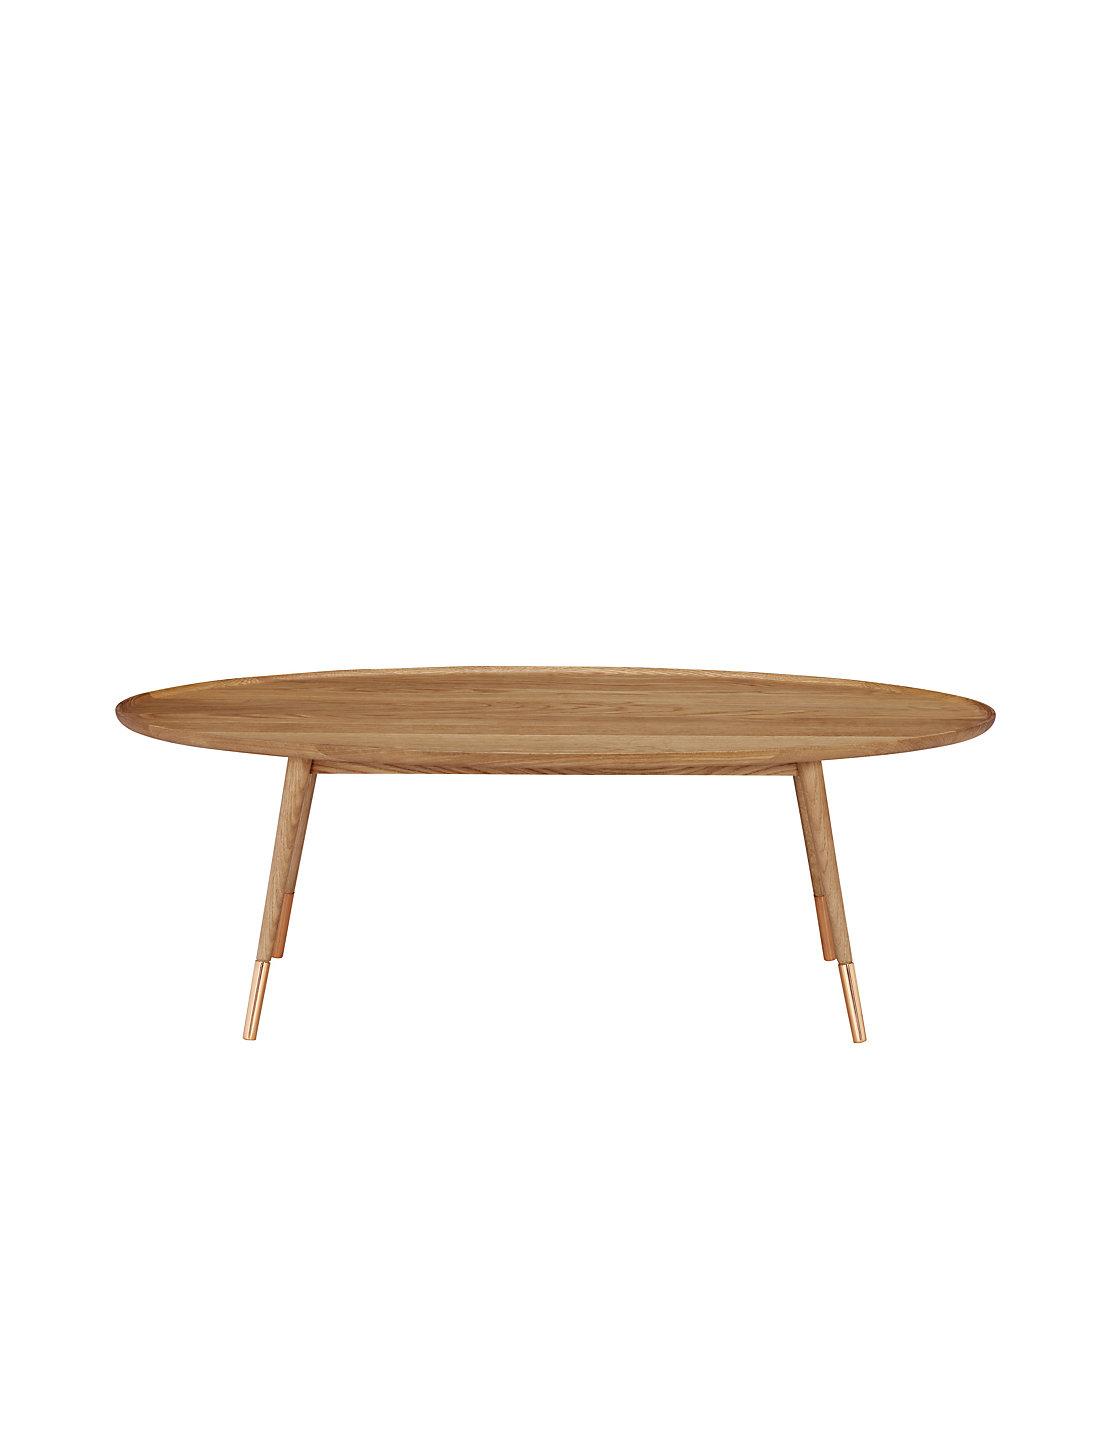 Conran kitson coffee table ms conran kitson coffee table geotapseo Choice Image